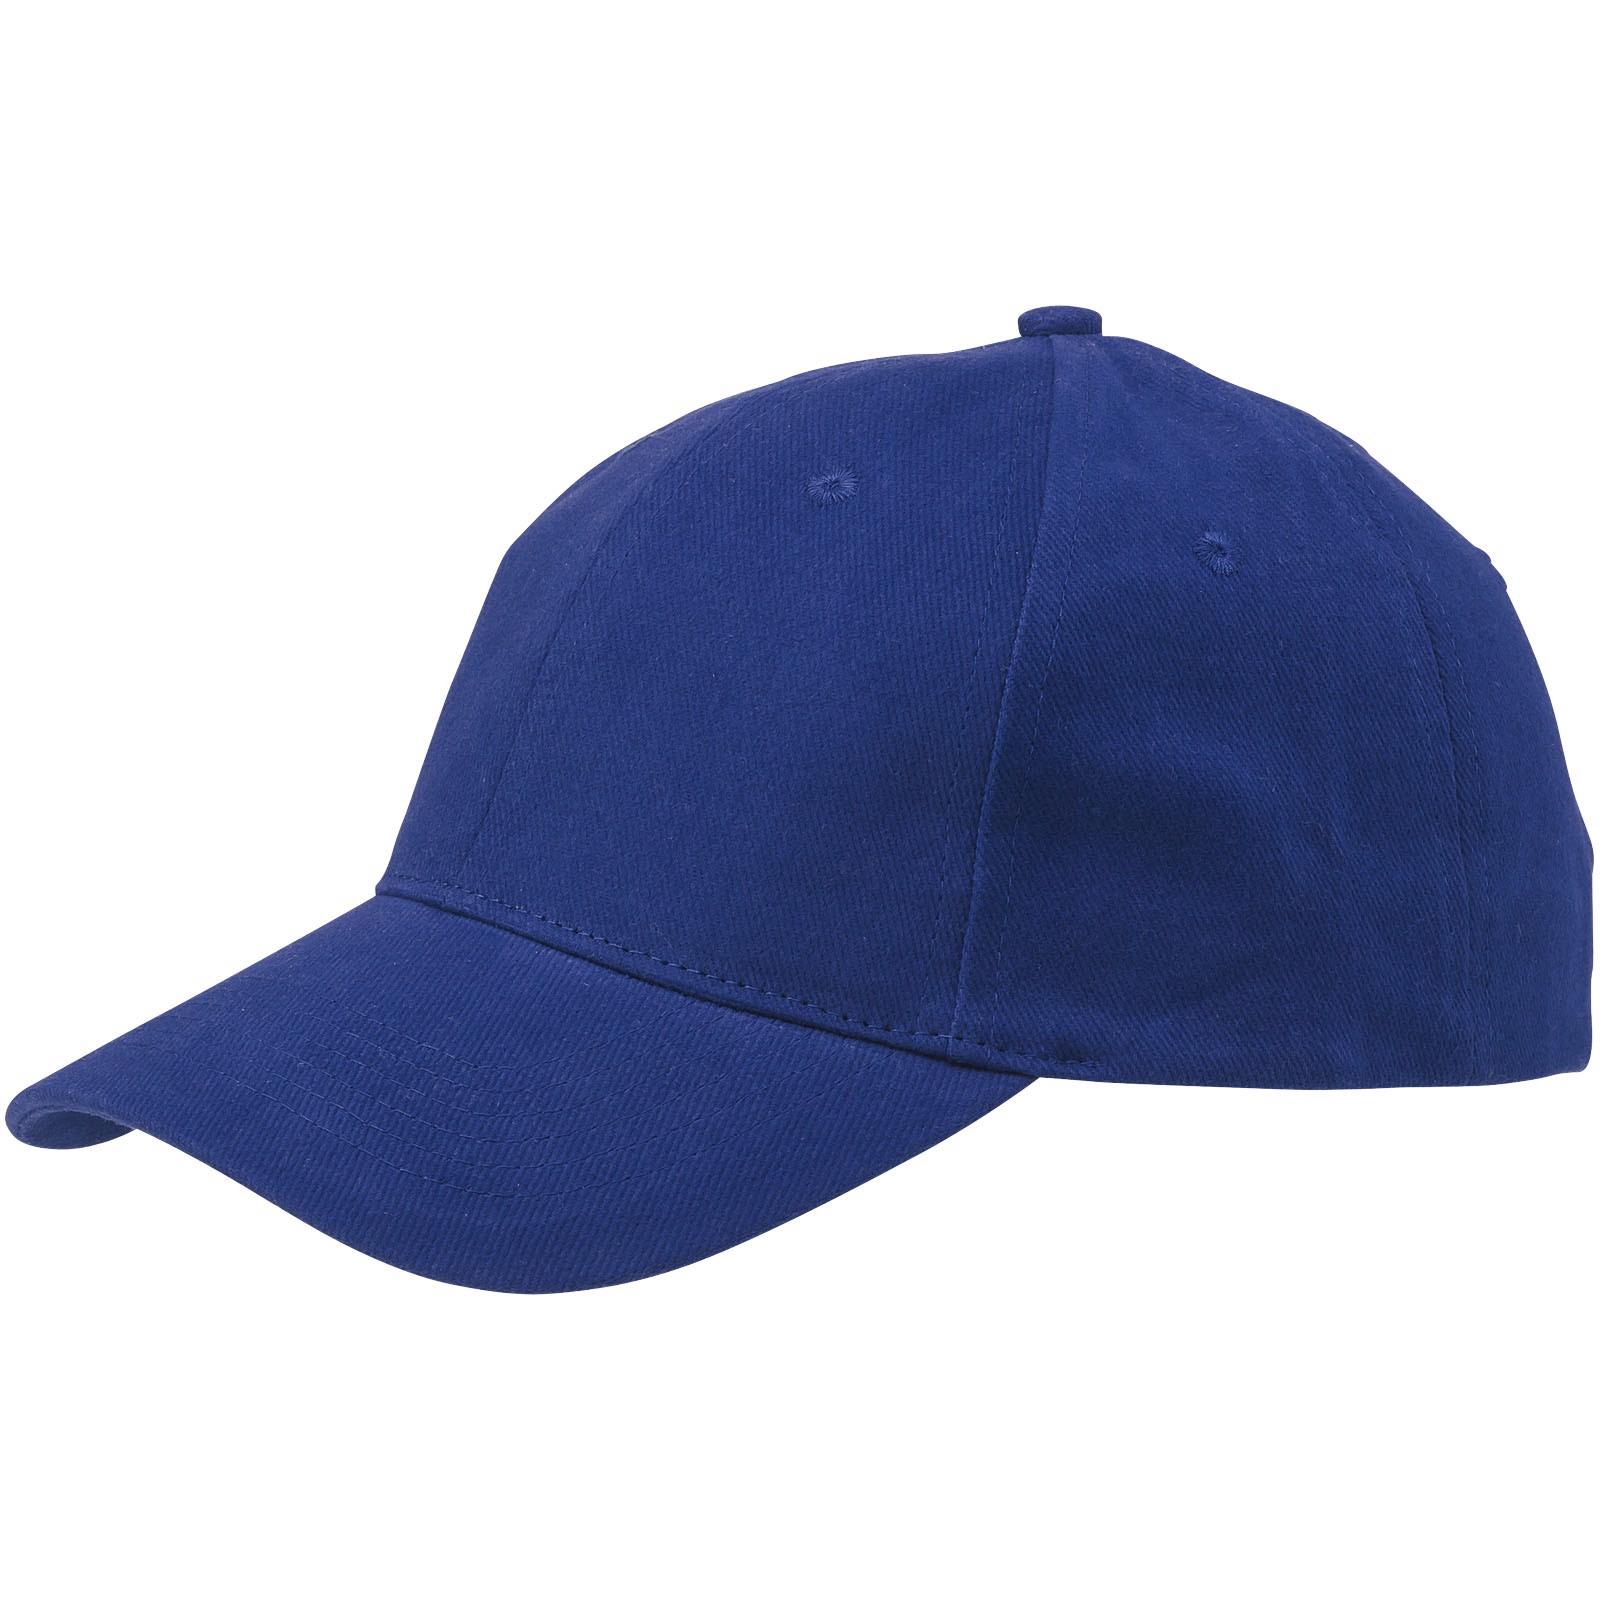 Bryson 6 panel cap - Blue